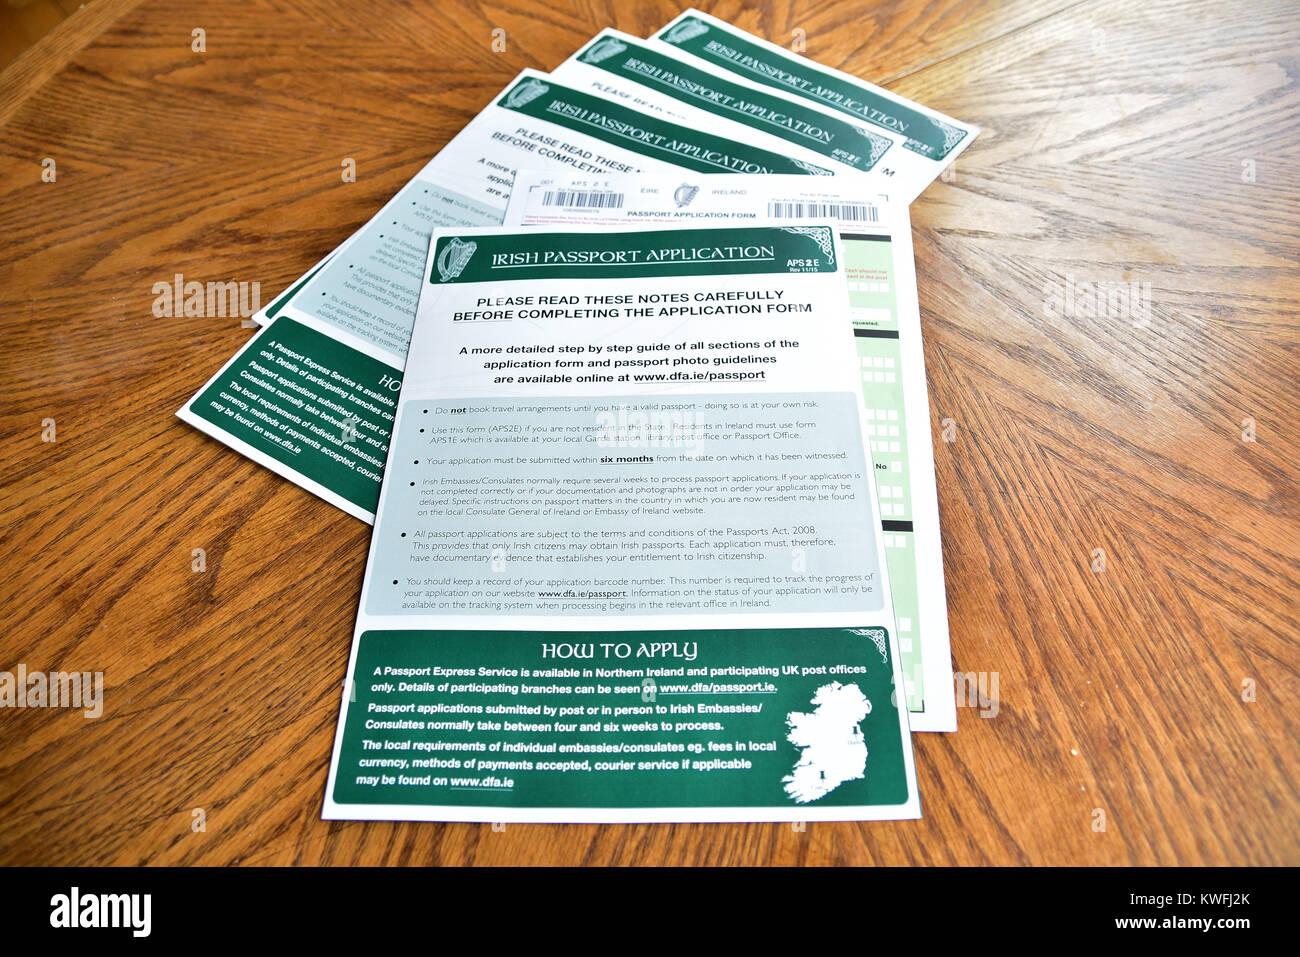 Irish passport application stock photos irish passport application surge in irish passport applications uk 2nd january 2017 credit mark winter falaconquin